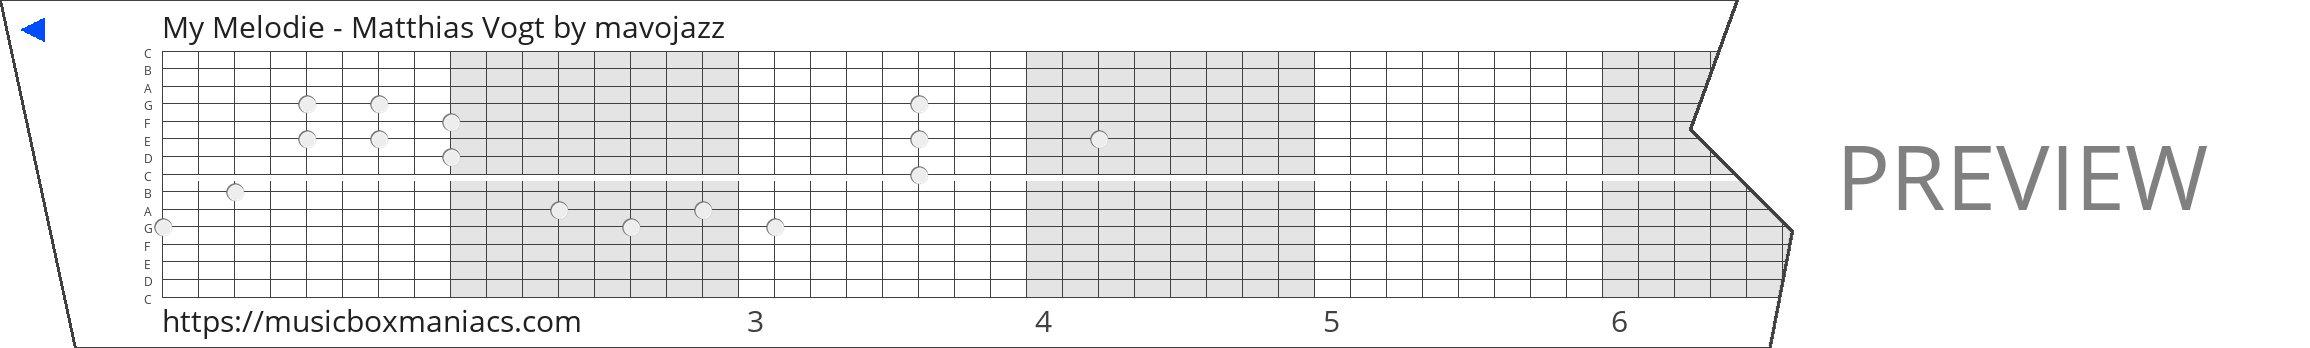 My Melodie - Matthias Vogt 15 note music box paper strip